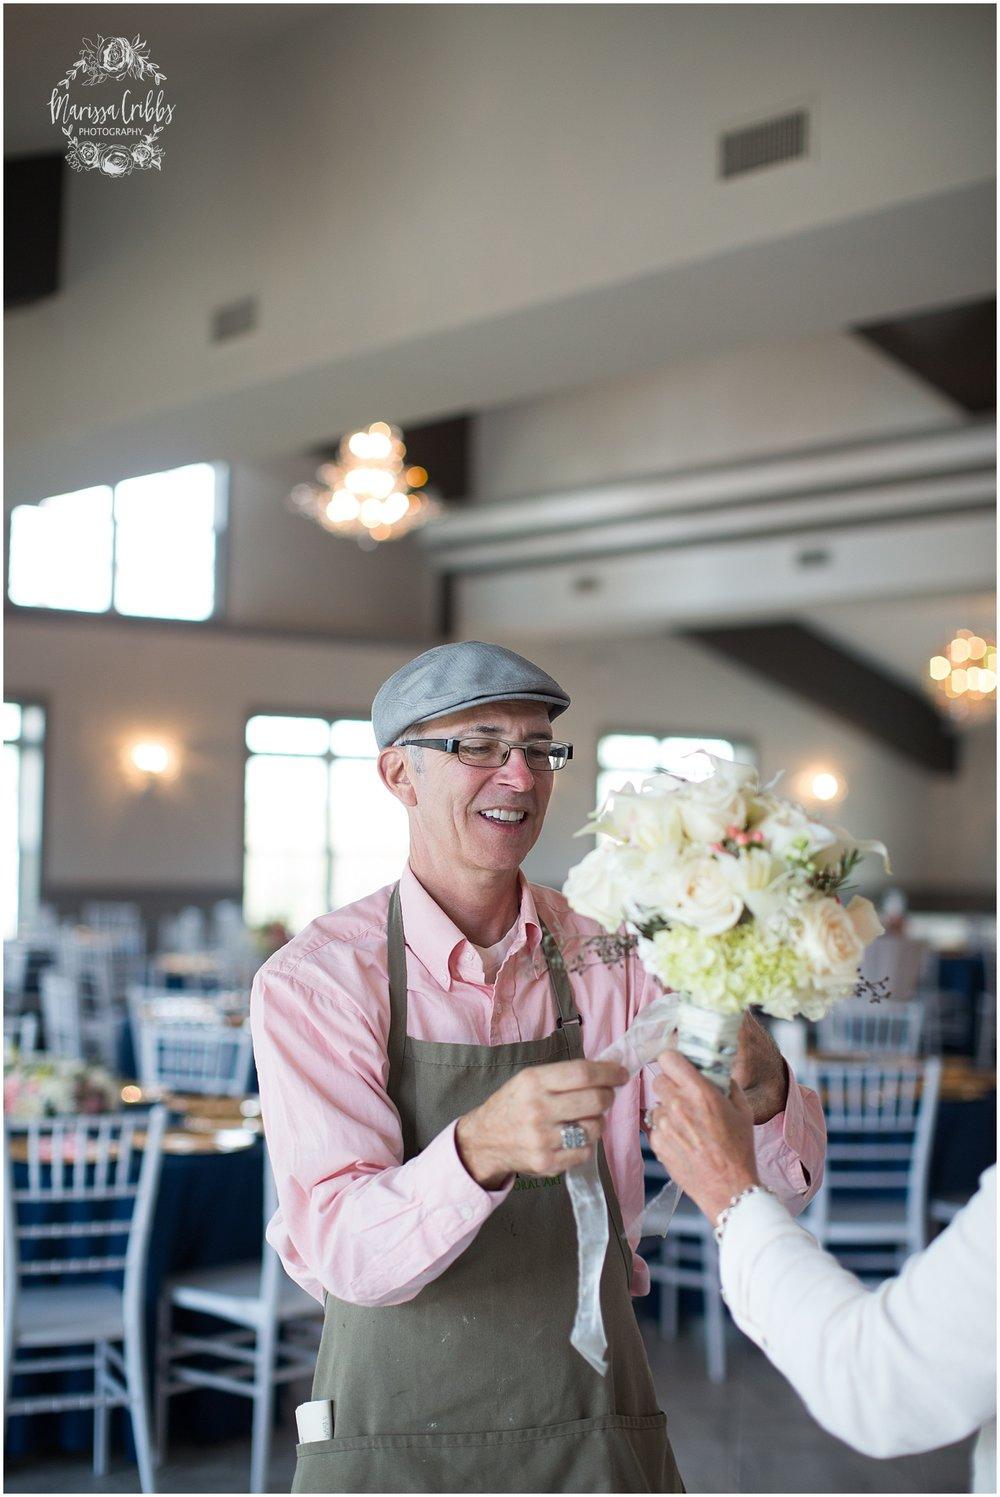 Alex & Amie | Eighteen Ninety Event Space | Marissa Cribbs Photography | Kansas City Perfect Wedding Guide_1280.jpg